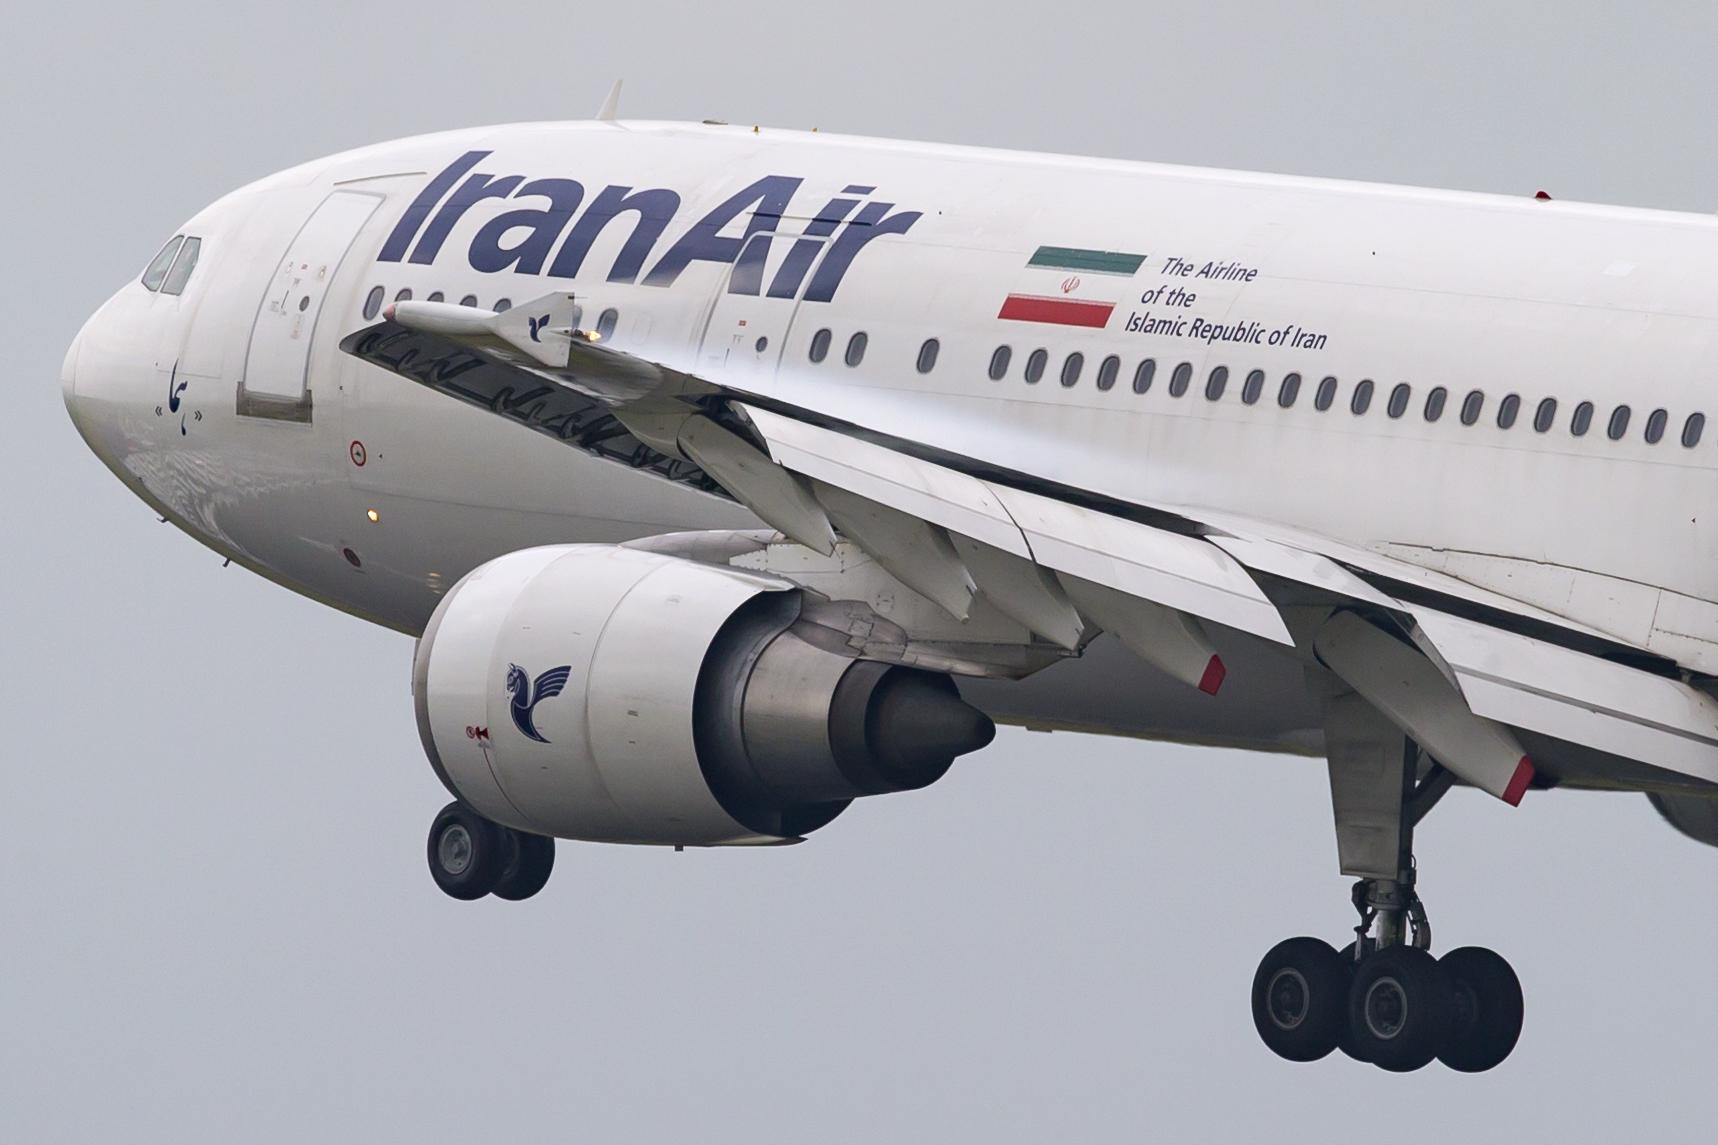 En Airbus A300-600 fra Iran Air. Foto: © Thorbjørn Brunander Sund, Danish Aviation Photo